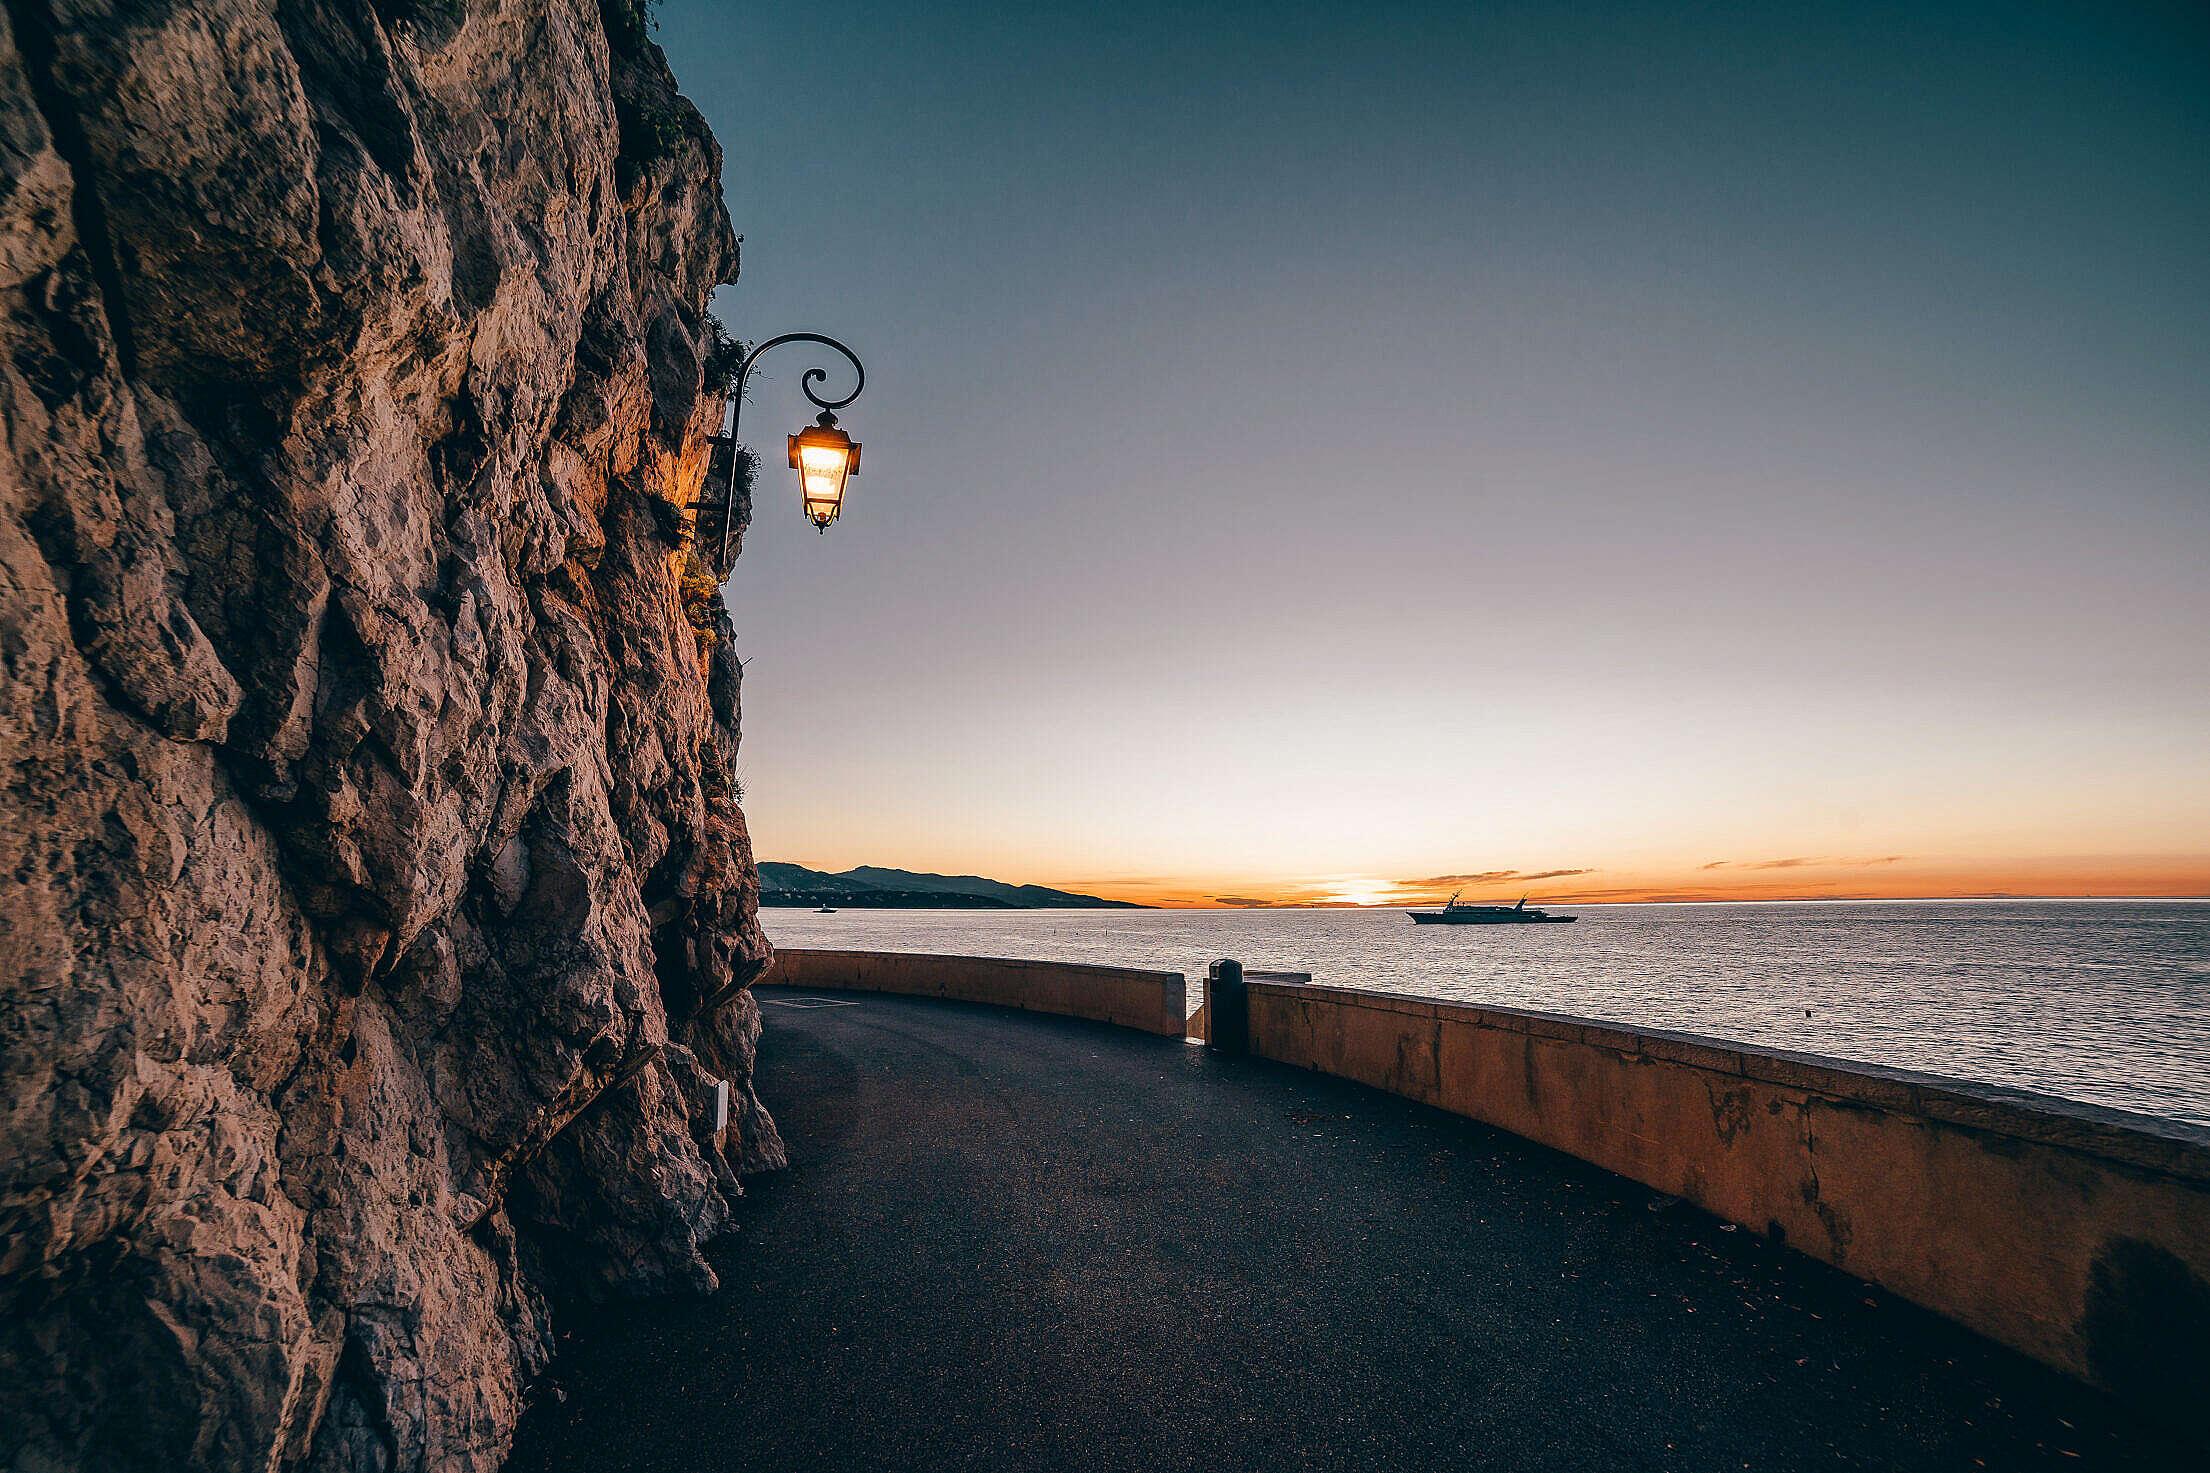 Early Morning in Monaco Free Stock Photo